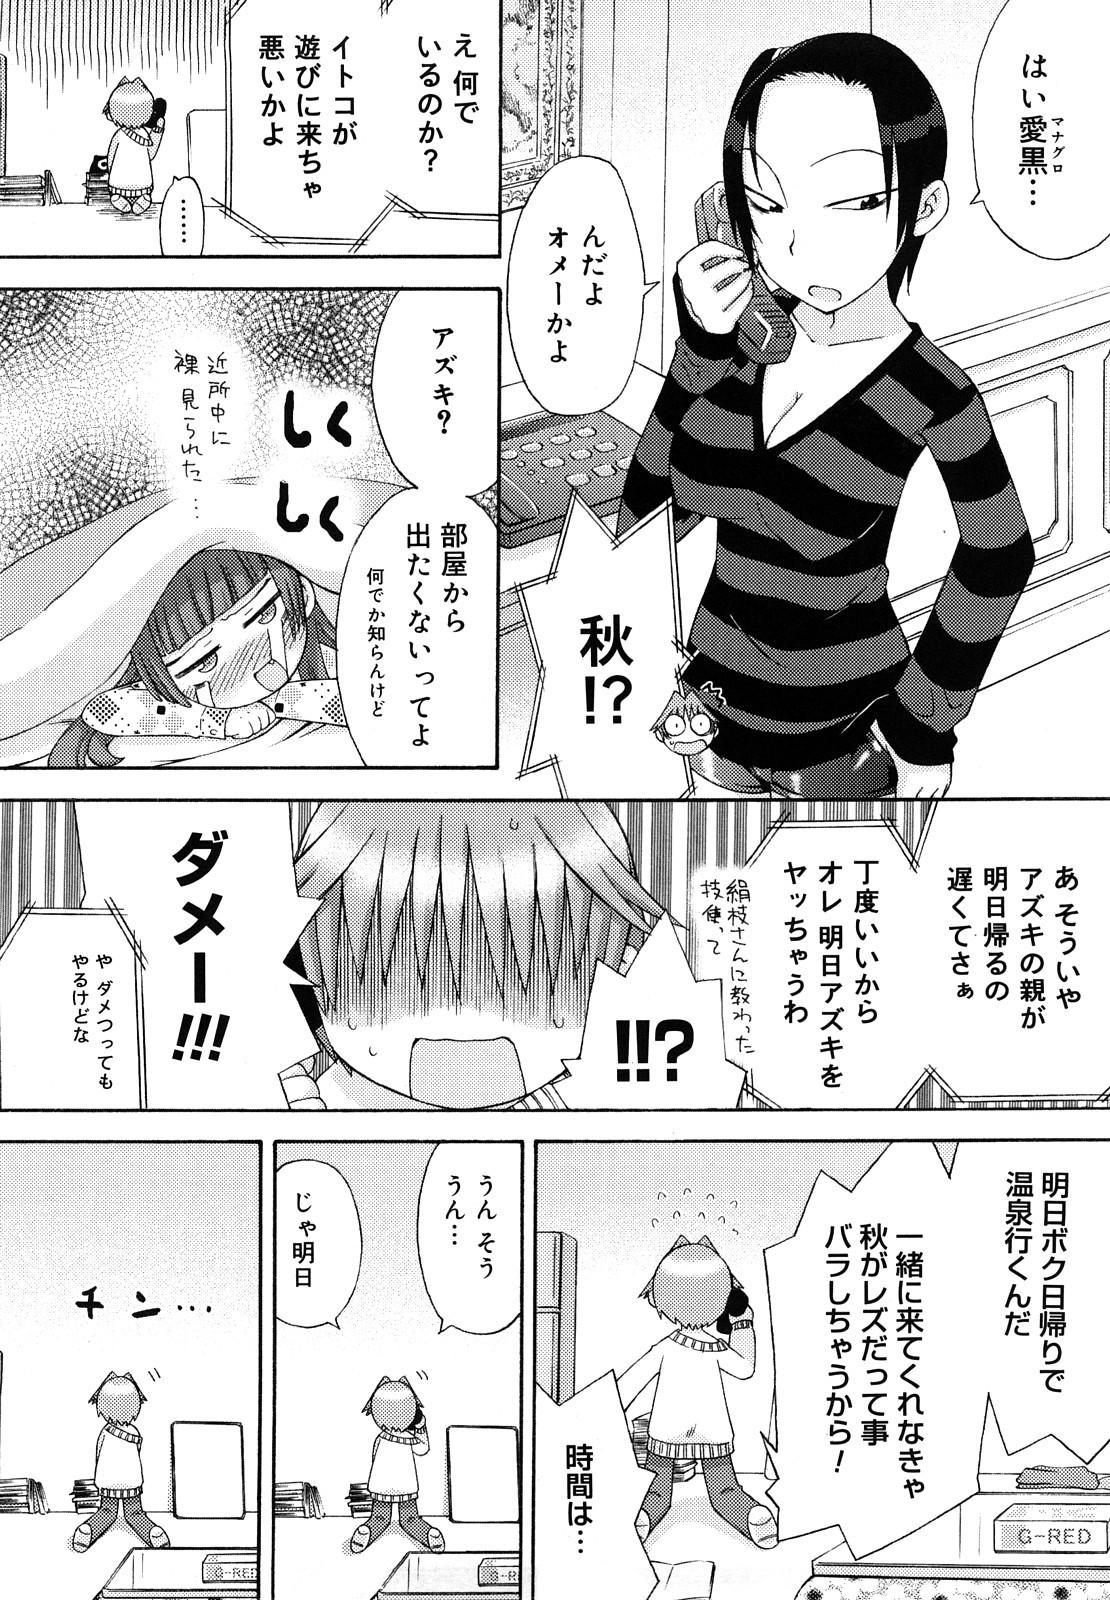 Hatsuden Pandakun! Shinsouban 130